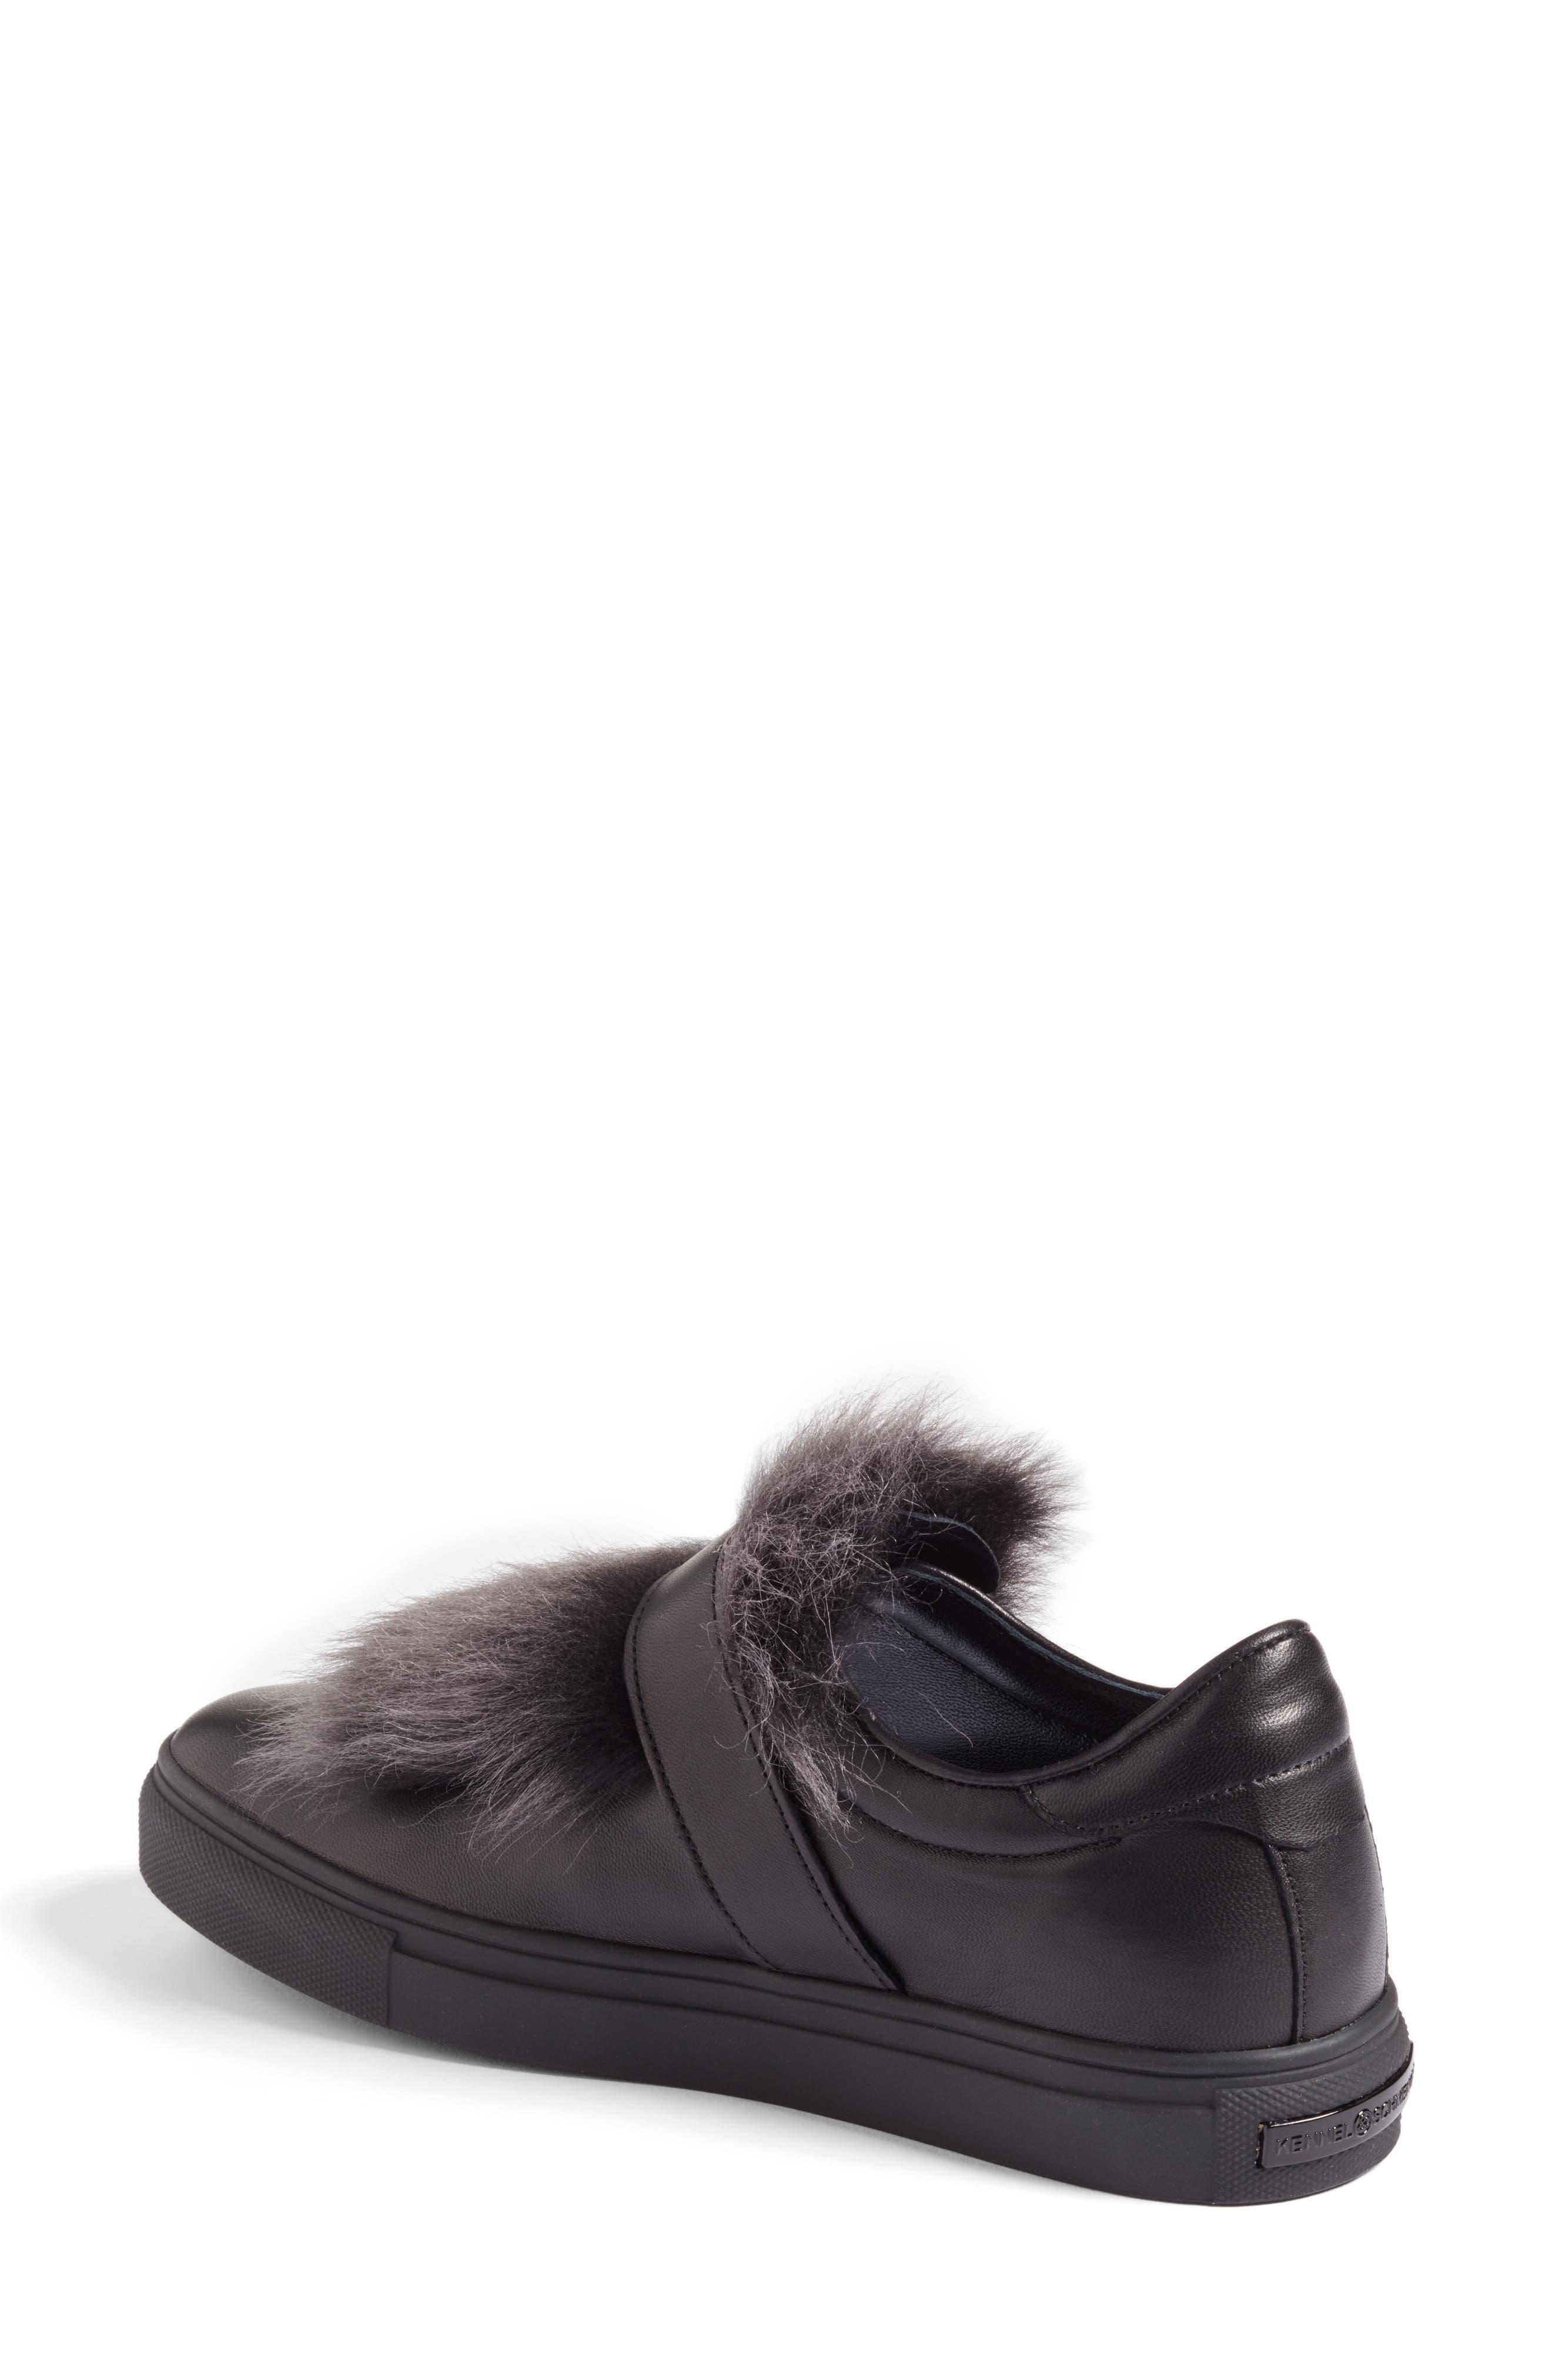 Kennel & Schmenger Basket Slip-On Sneaker with Genuine Shearling Trim,                             Alternate thumbnail 2, color,                             001